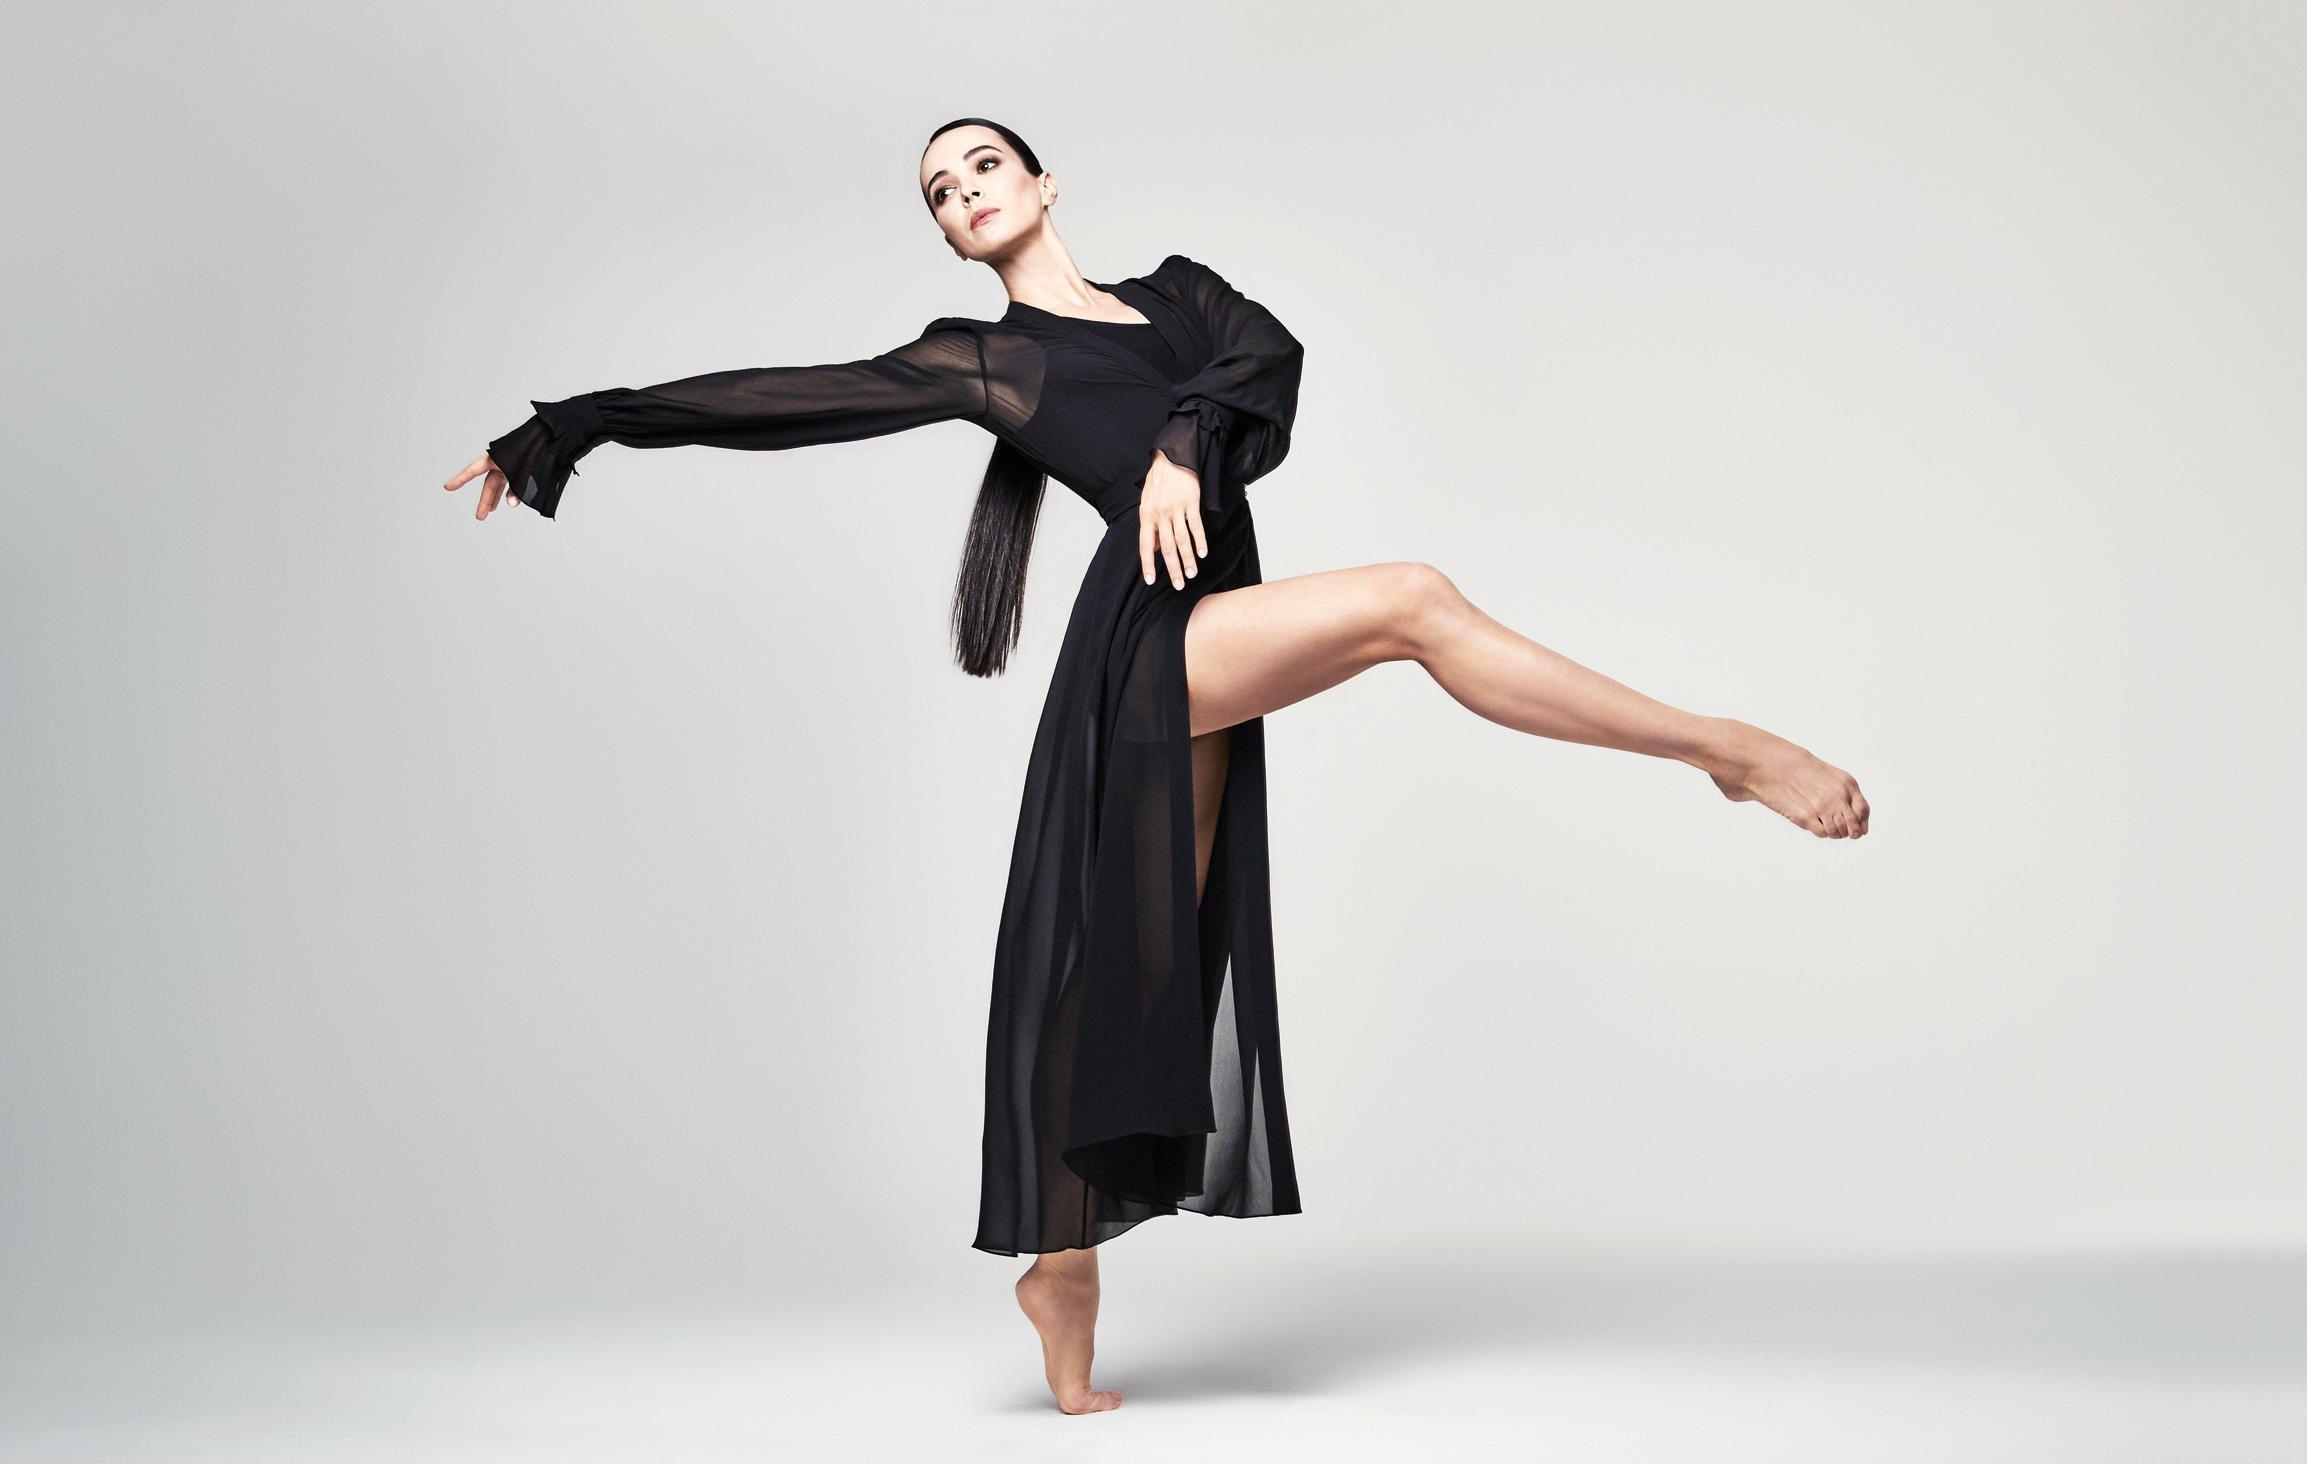 Диана Вишнева проведет открытый мастер-класс